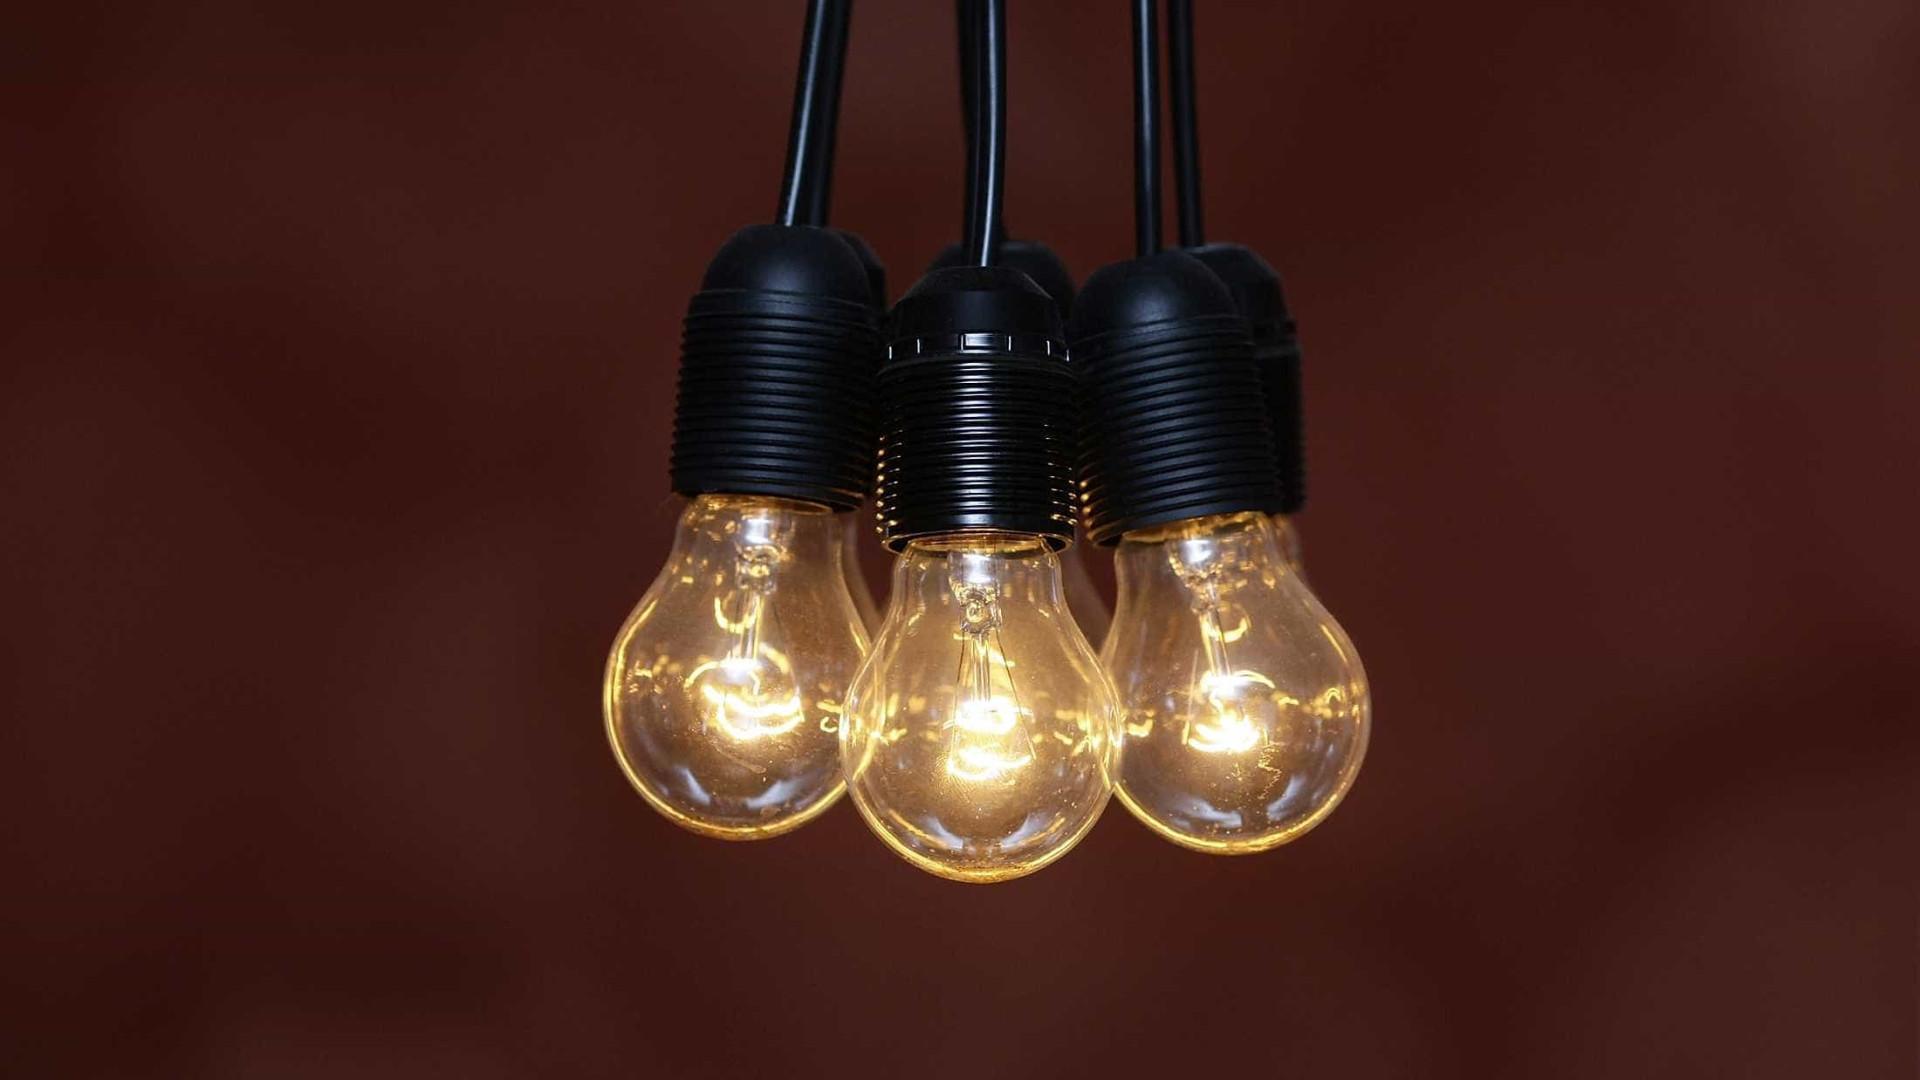 MARL instala lâmpadas Led e poupa 100 mil euros por ano